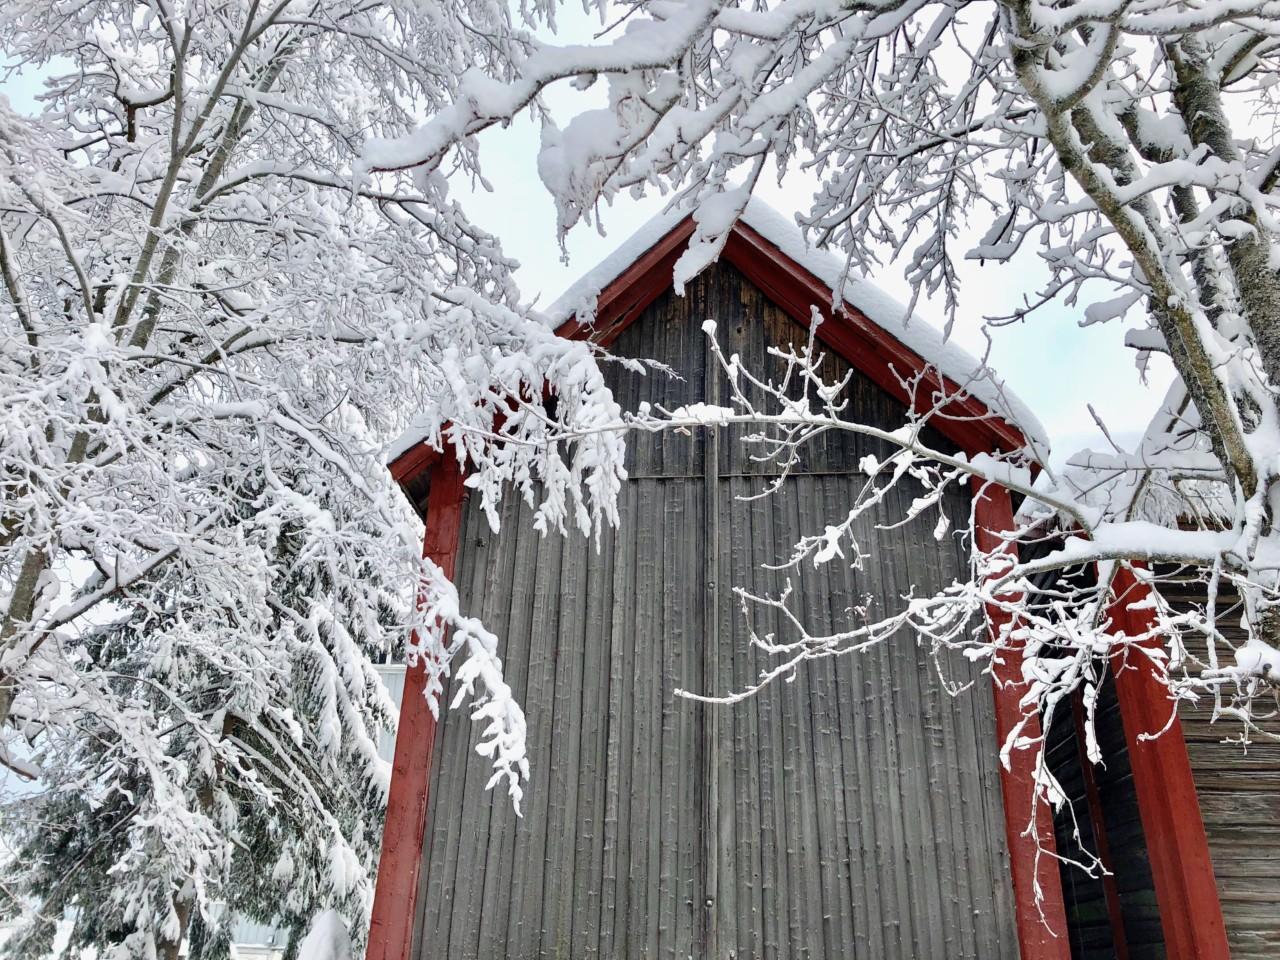 vestre-gausdal-landskap-snow-juleferie-anja-stang